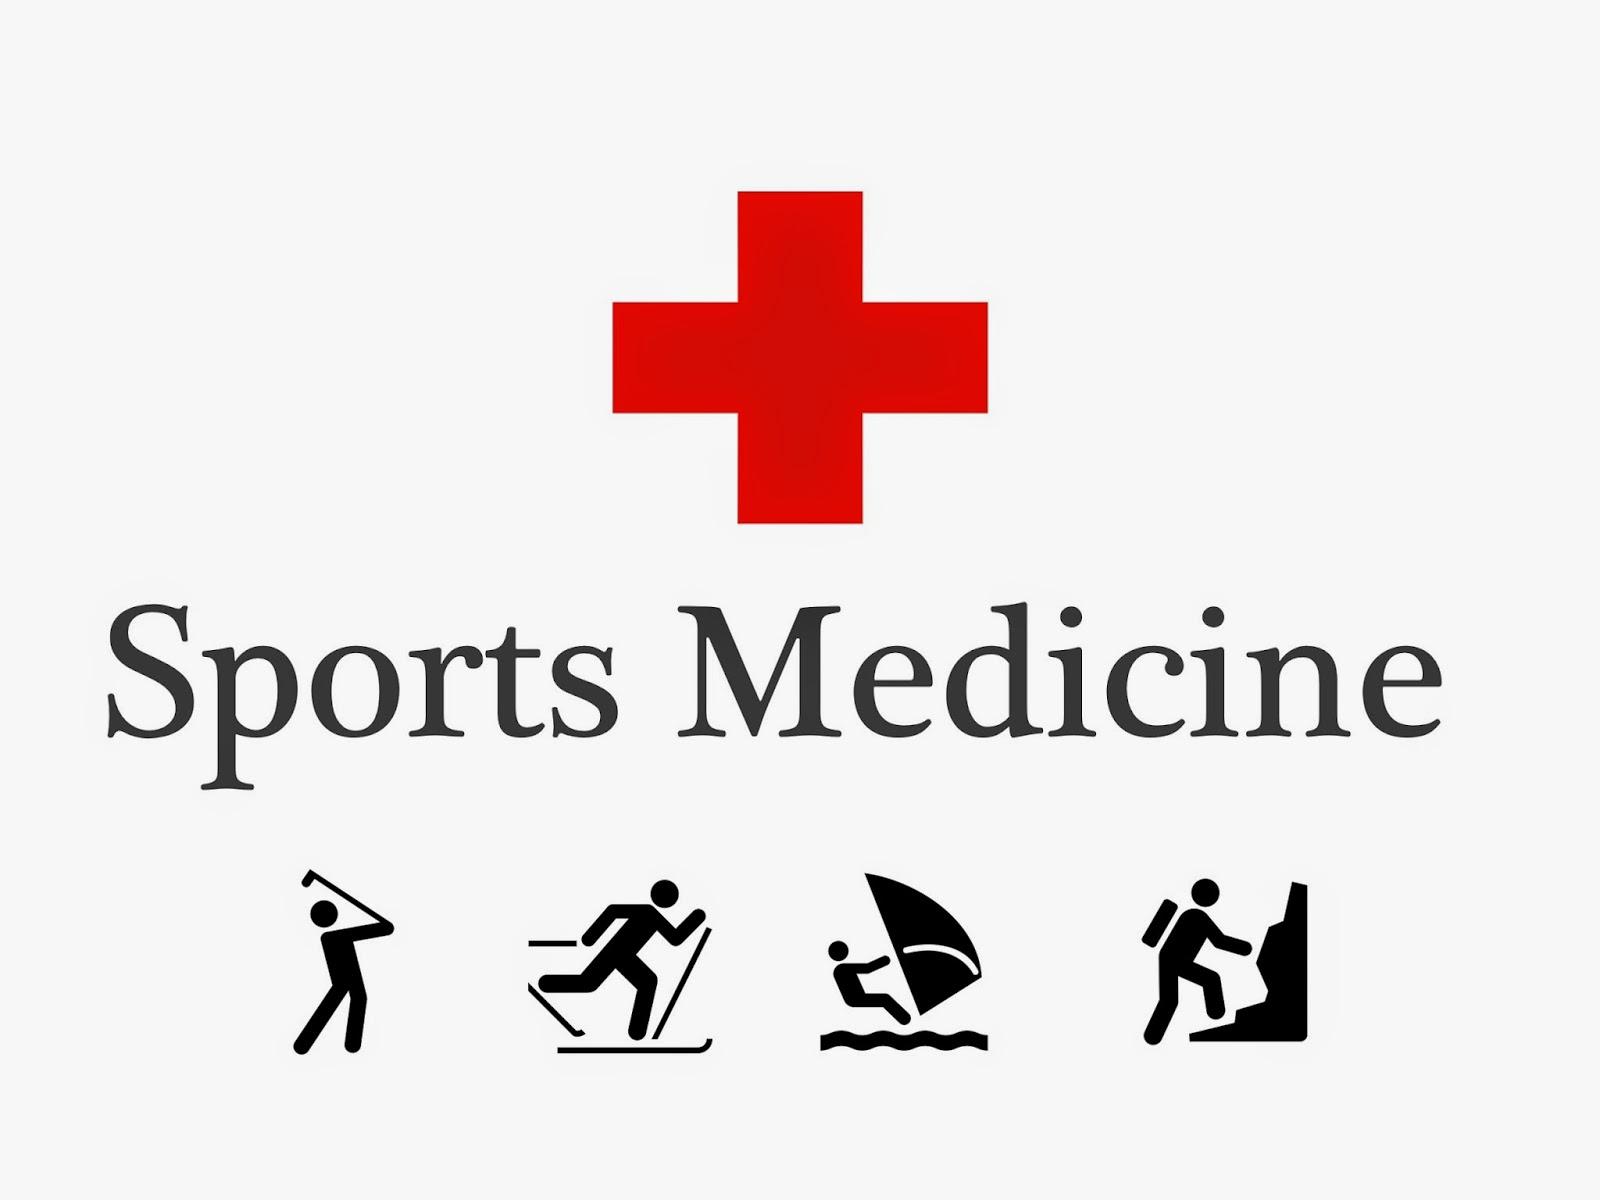 Therapy clipart sports medicine. Free cliparts download clip